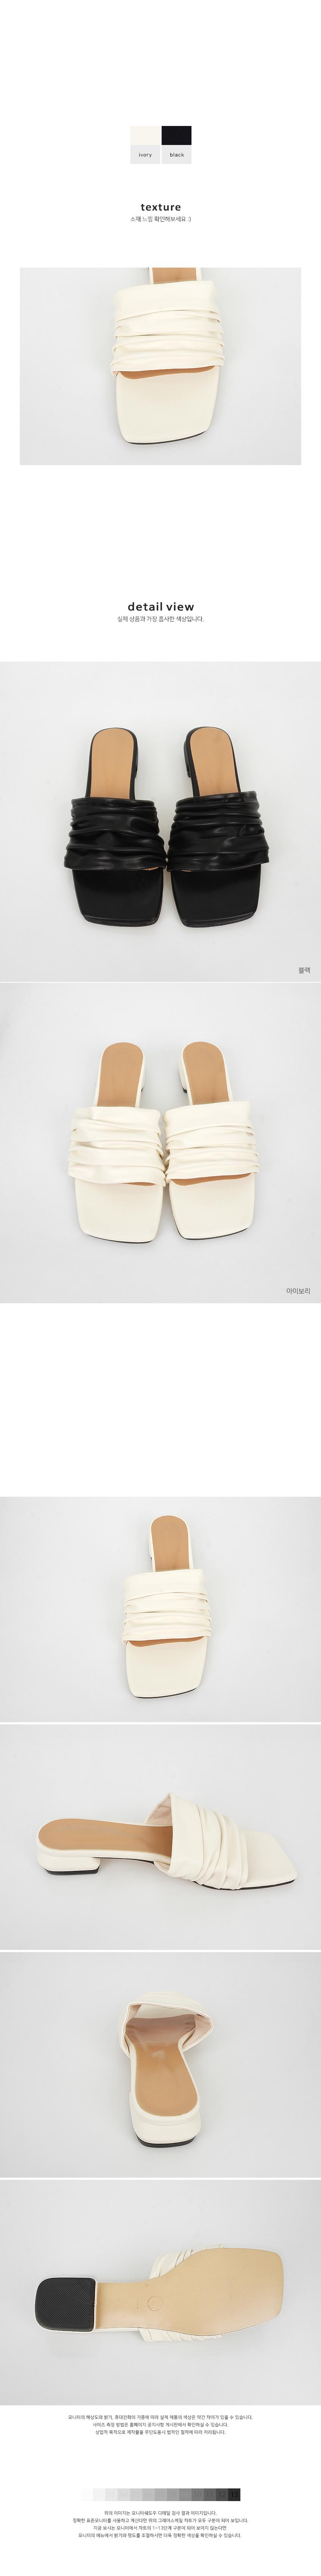 Wrinkle bold slippers